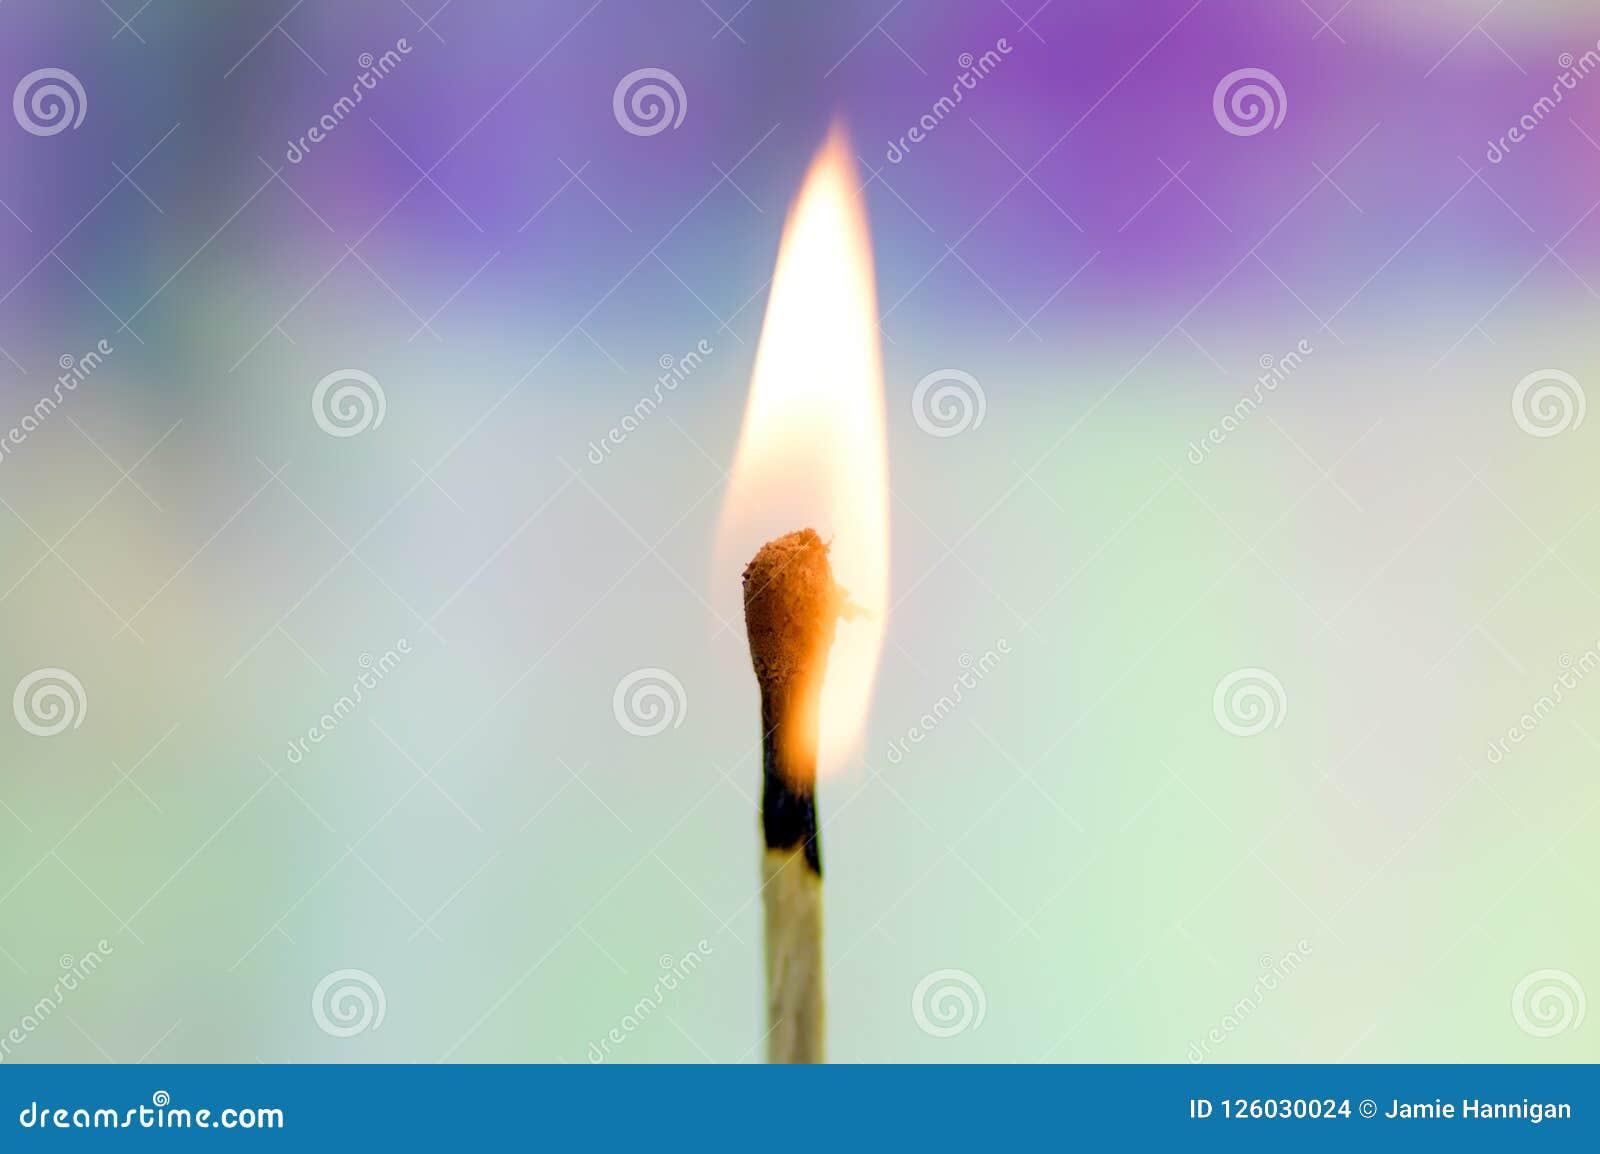 Burning Match with Rainbow Background